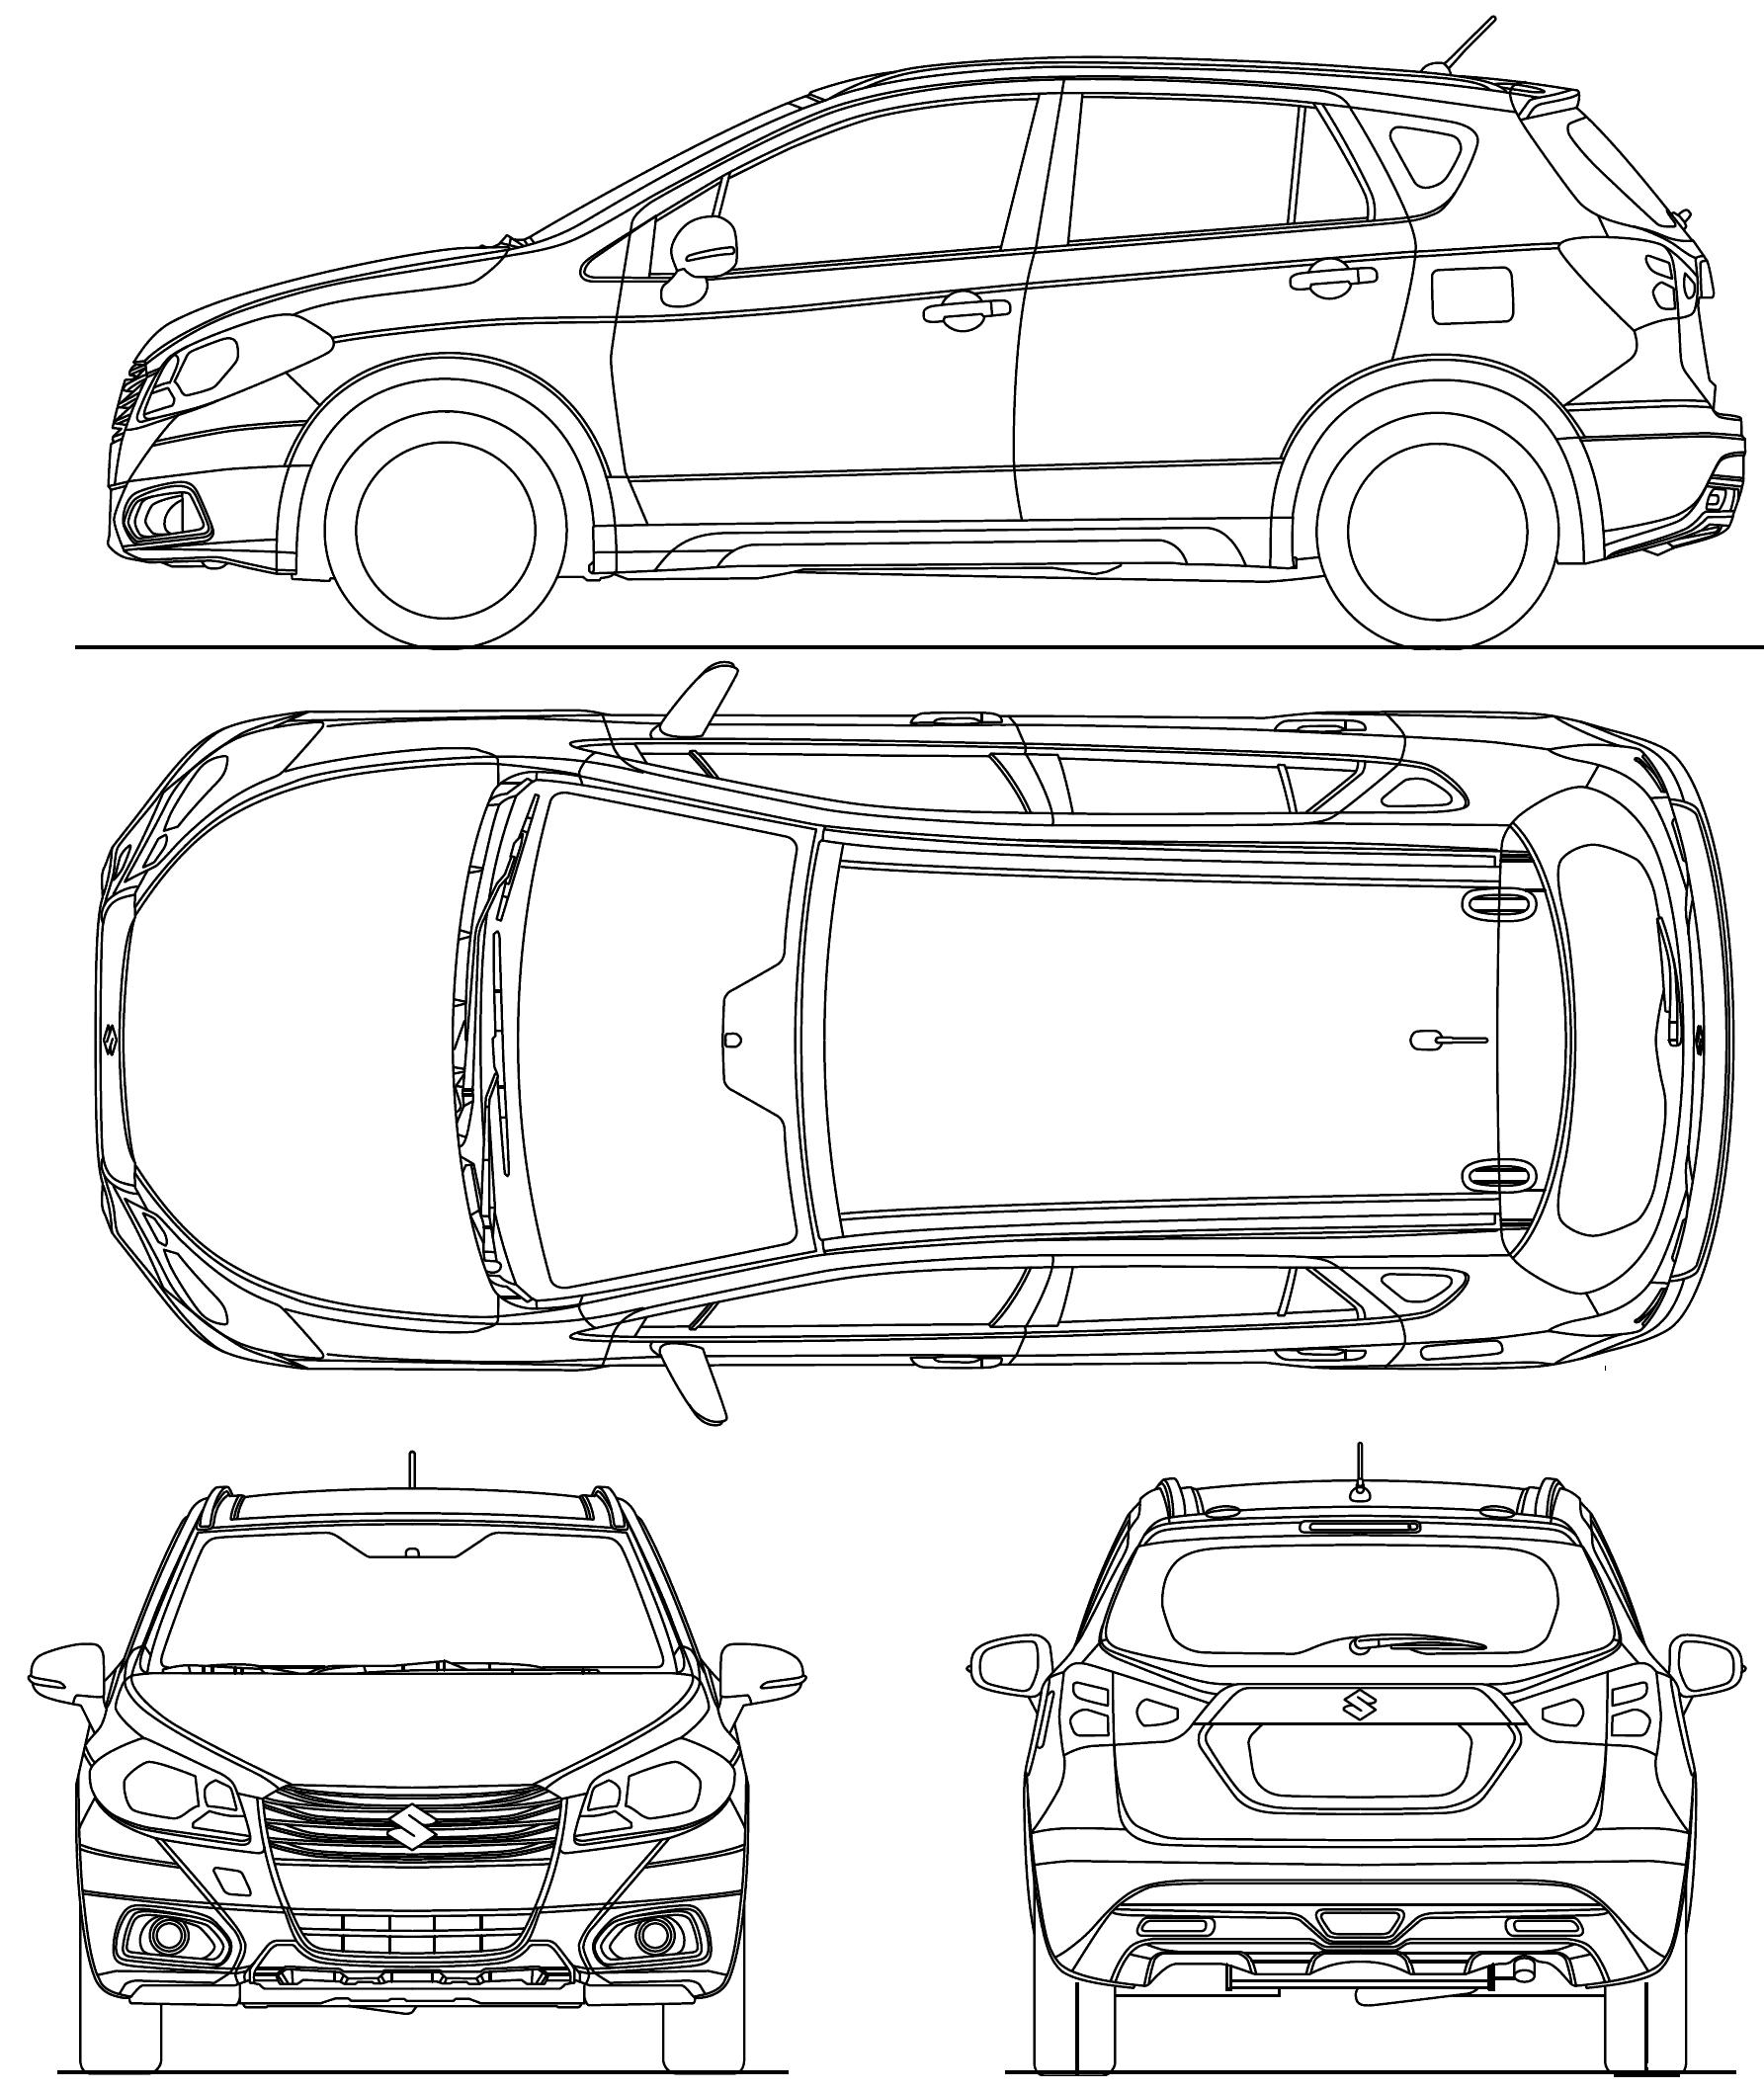 Suzuki Sx4 S Cross Blueprint